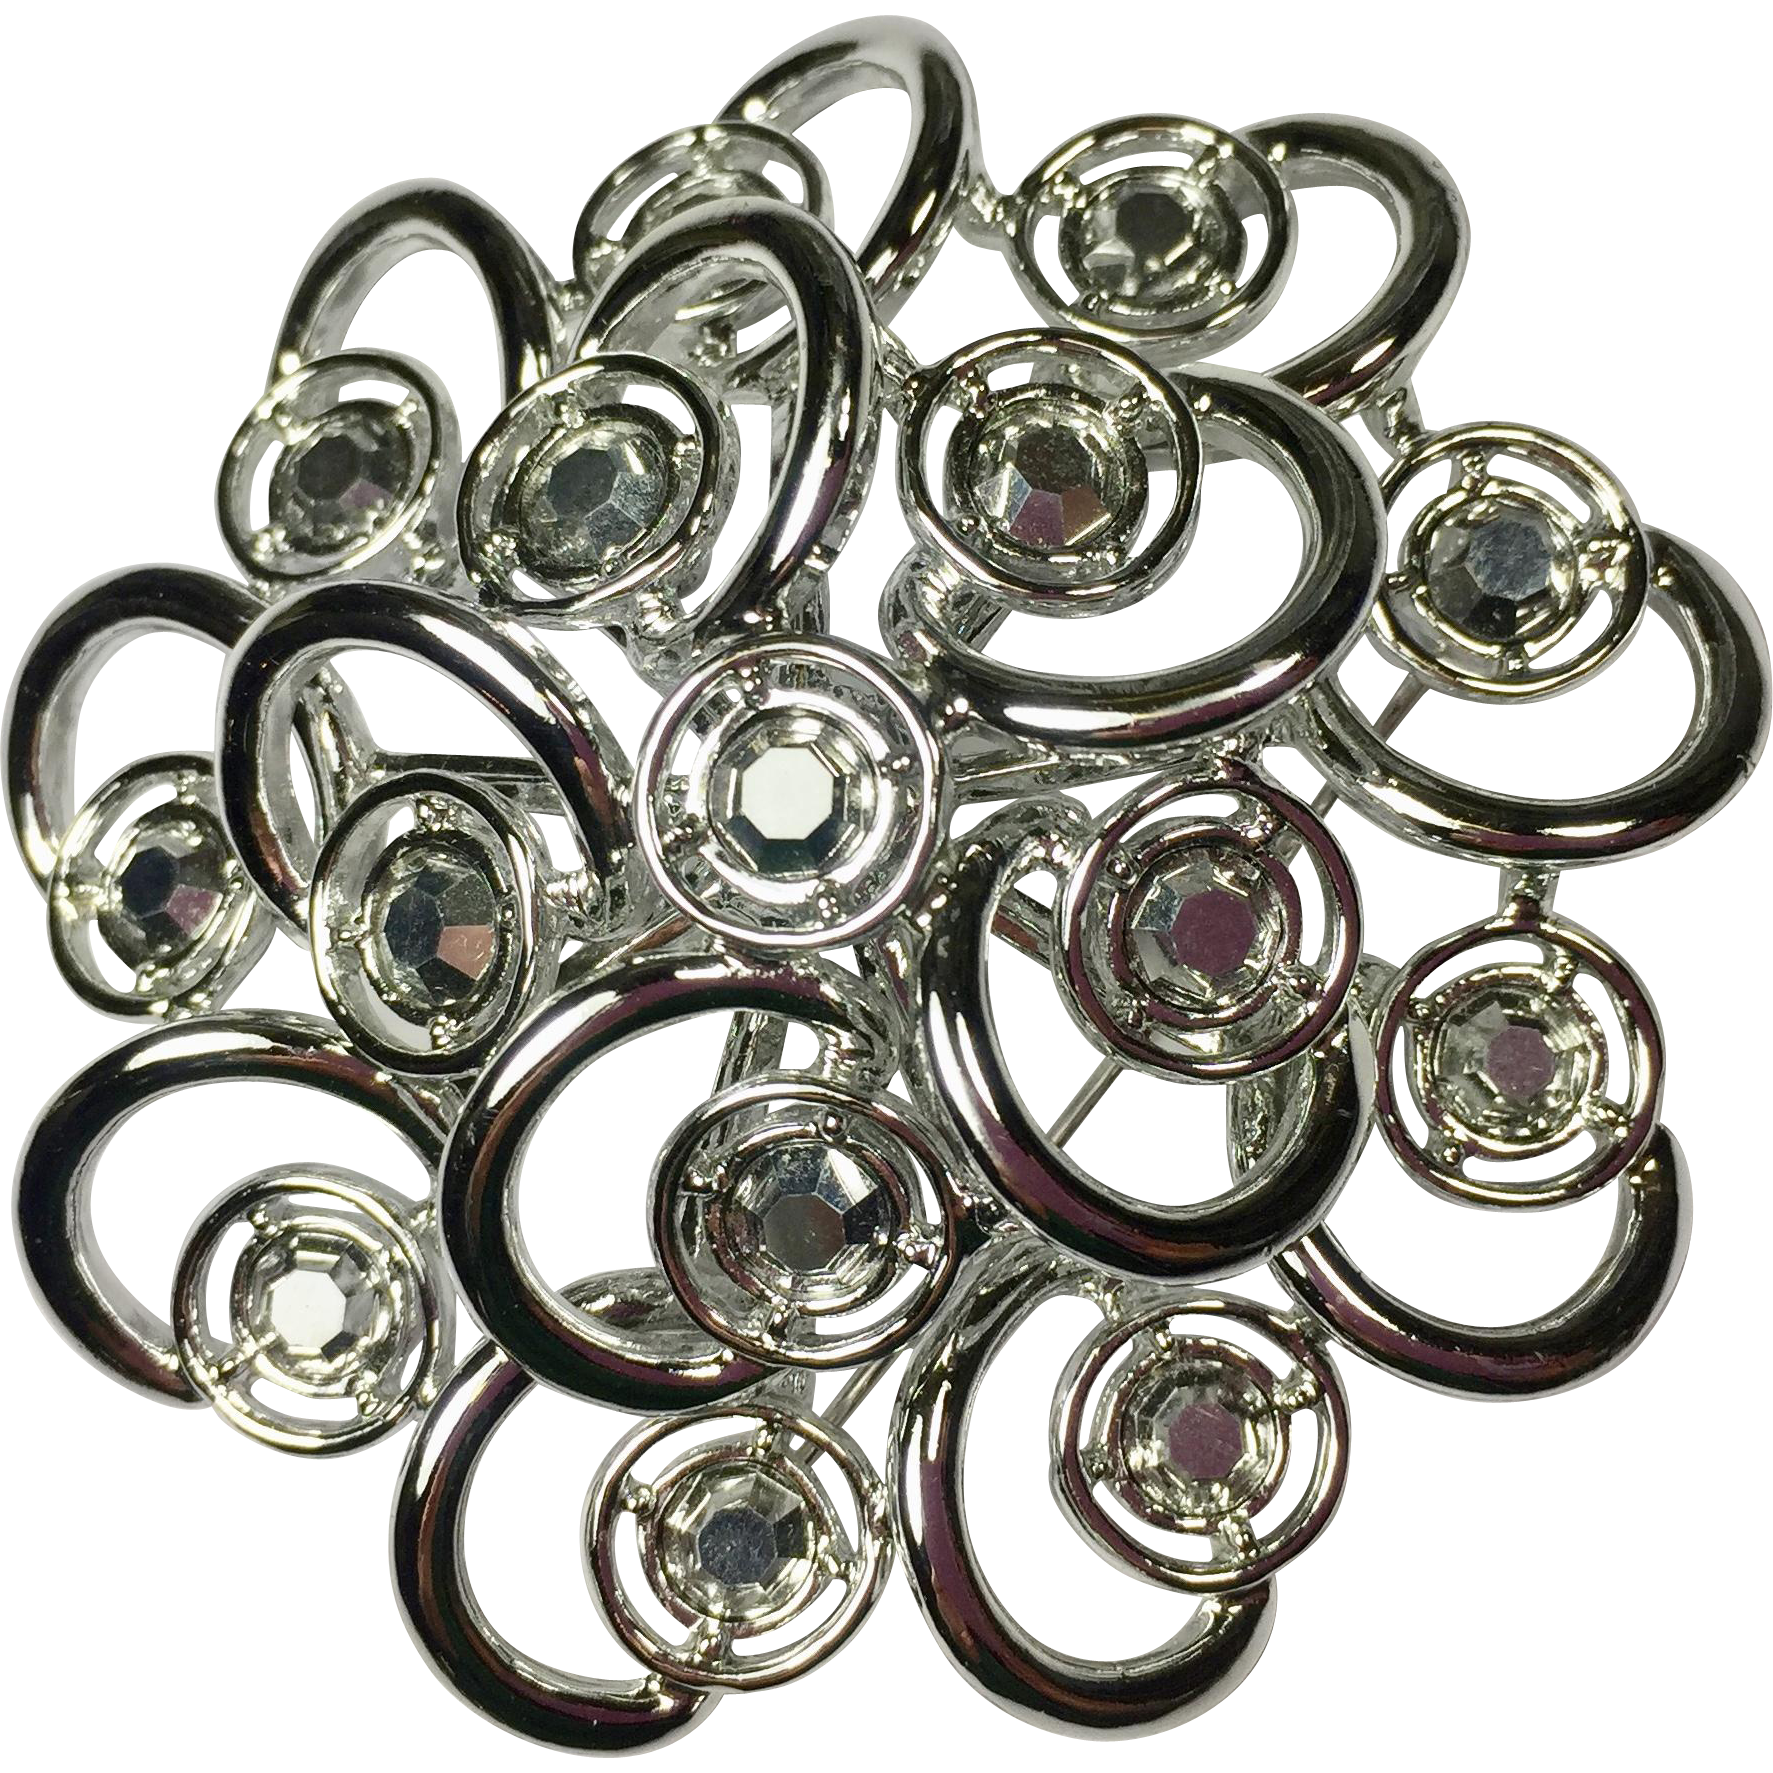 Atomic Spiral Brooch w Aurora Borealis Rhinestones by Sarah Coventry